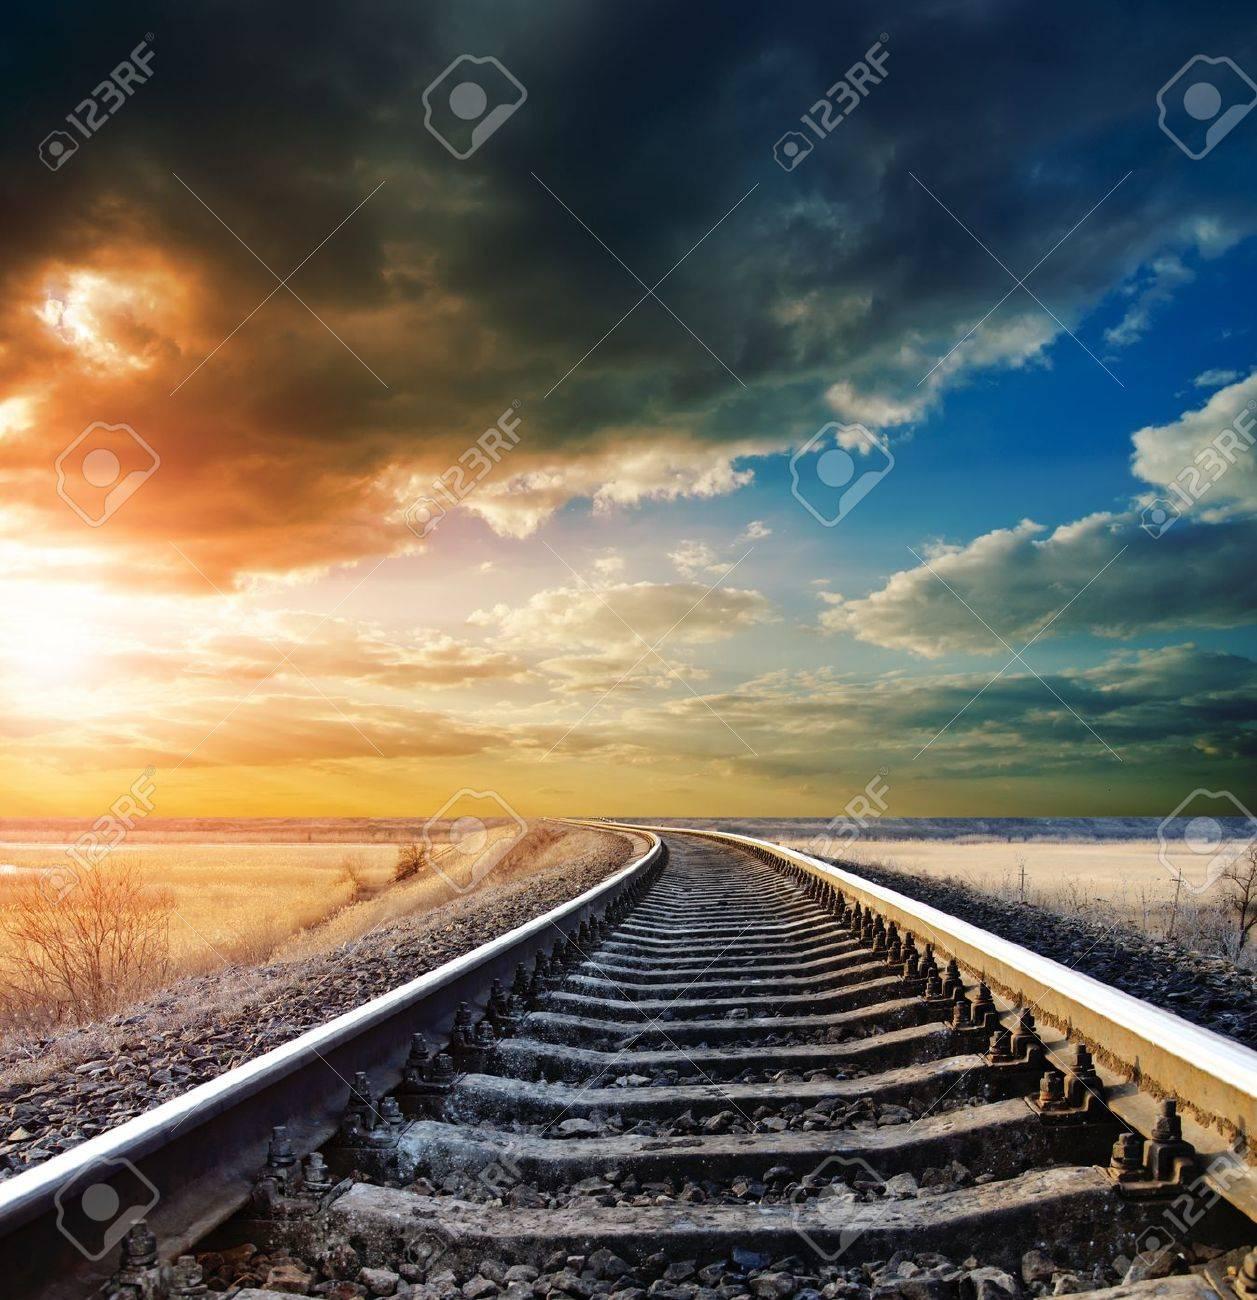 railway to horizon - 9223426